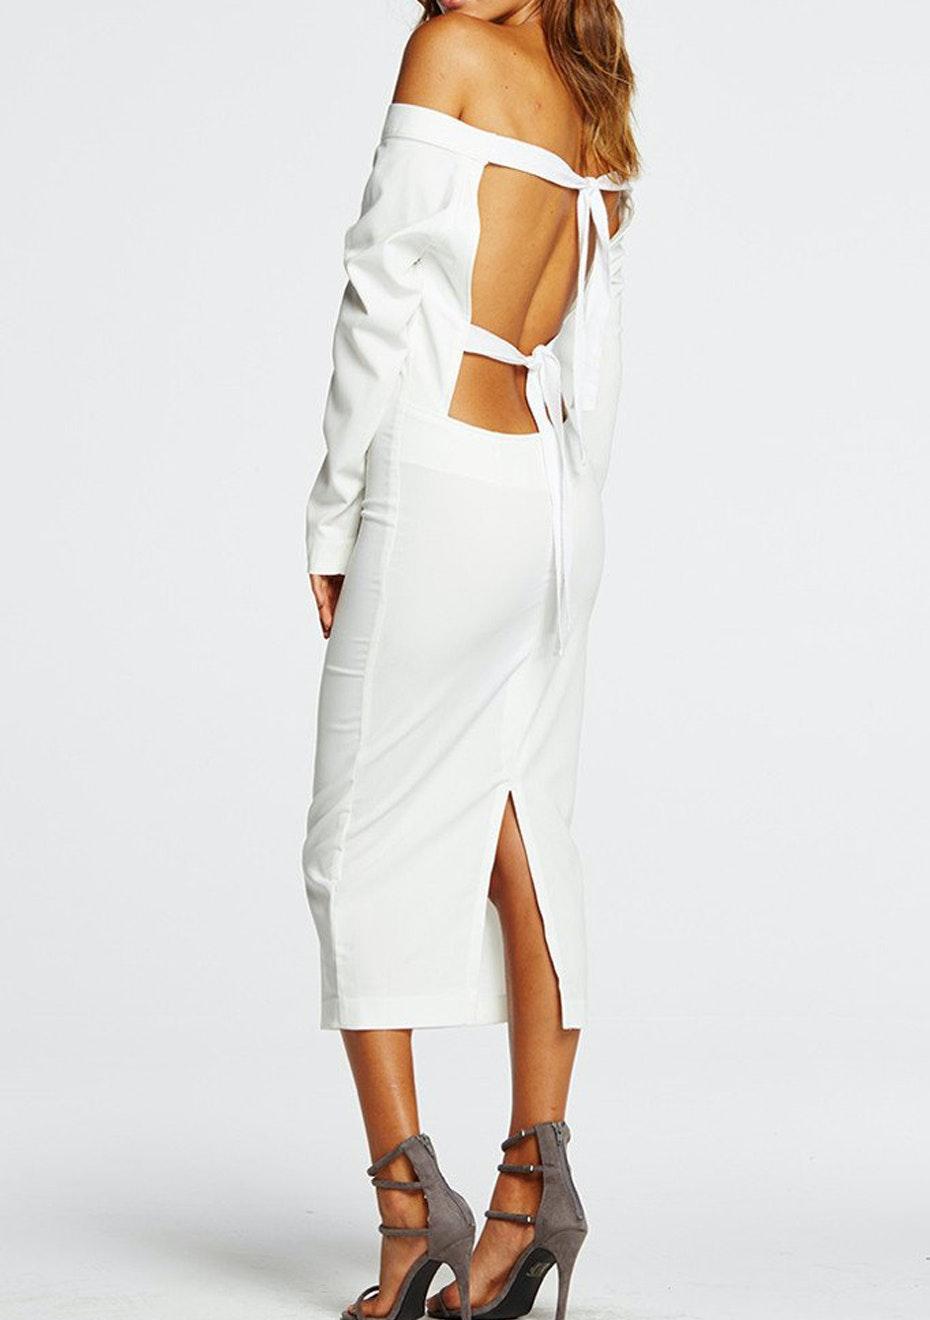 Maurie & Eve - Close to the Edge Dress- White